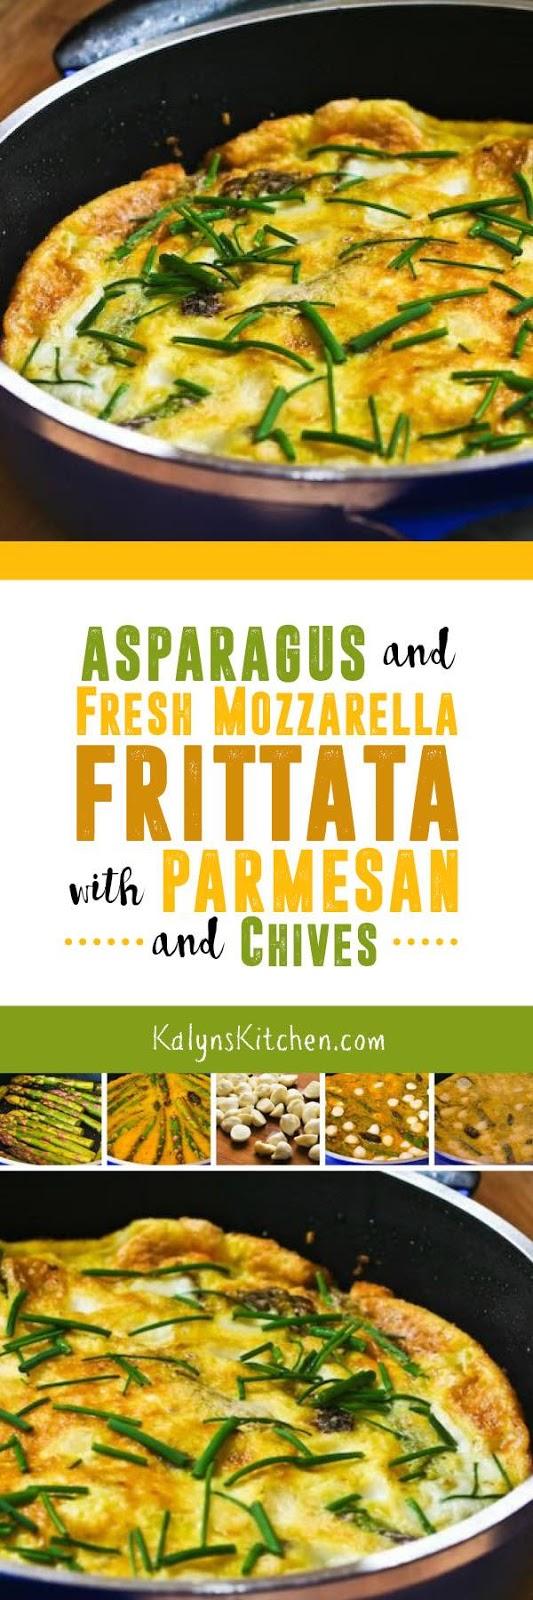 Asparagus and Fresh Mozzarella Frittata with Parmesan and ...